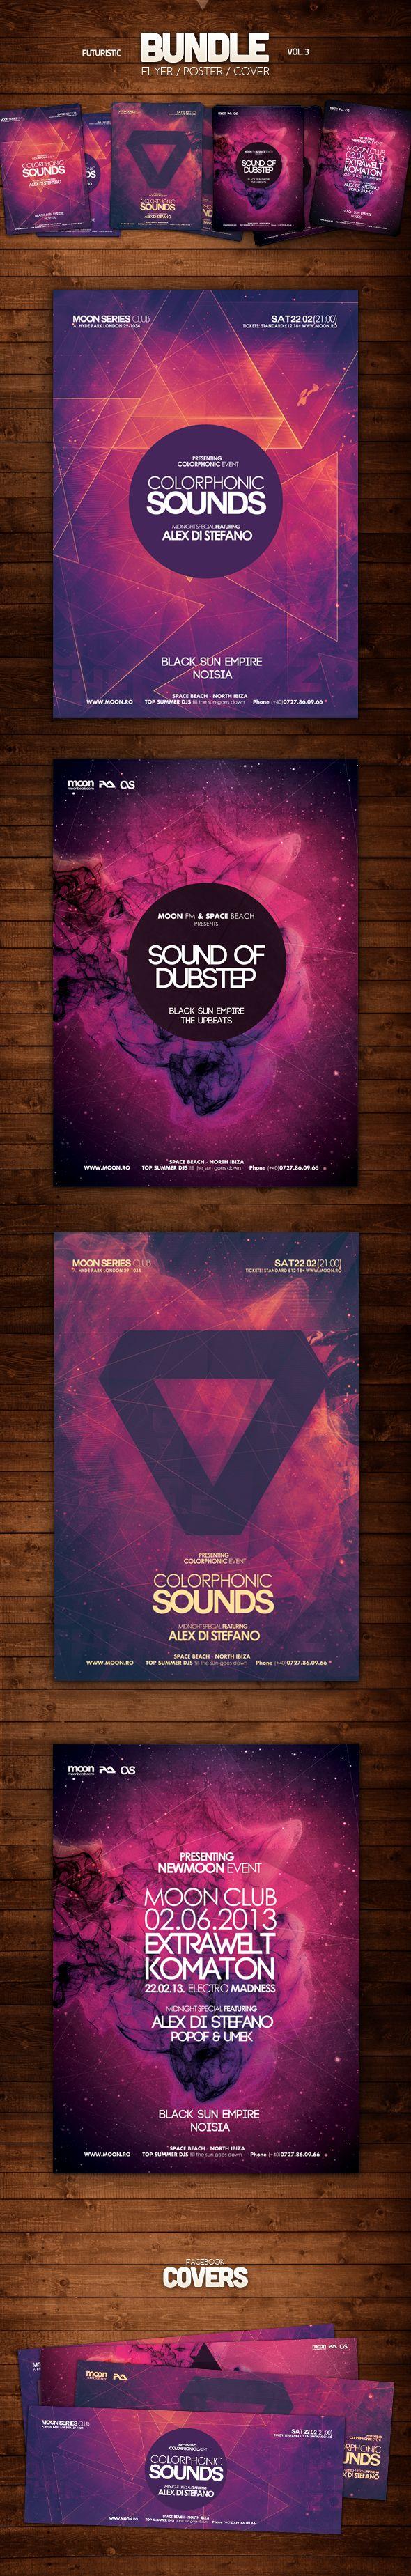 Futuristic Flyer Bundle Vol 3 on Behance event flyer & poster design…